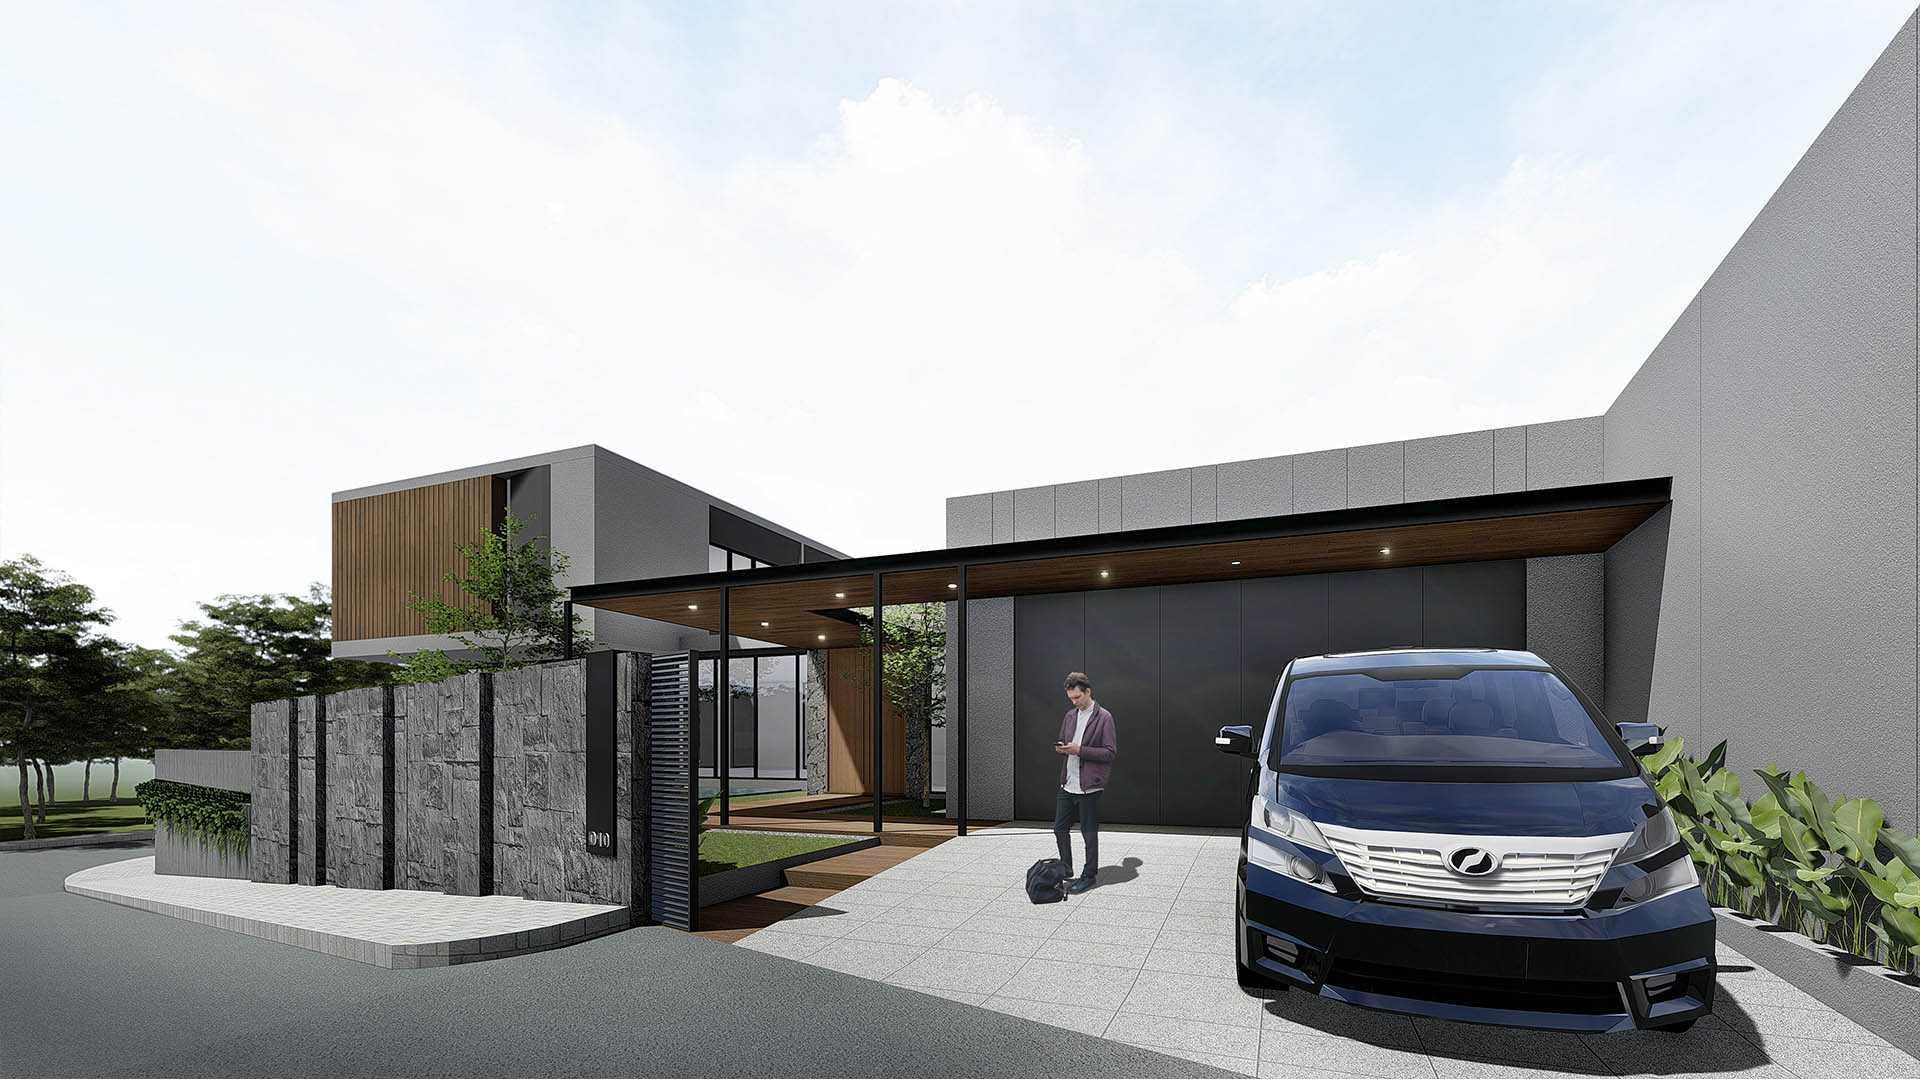 Co Associates J House Lampung, Indonesia Lampung, Indonesia Co-Associates-J-House   97055